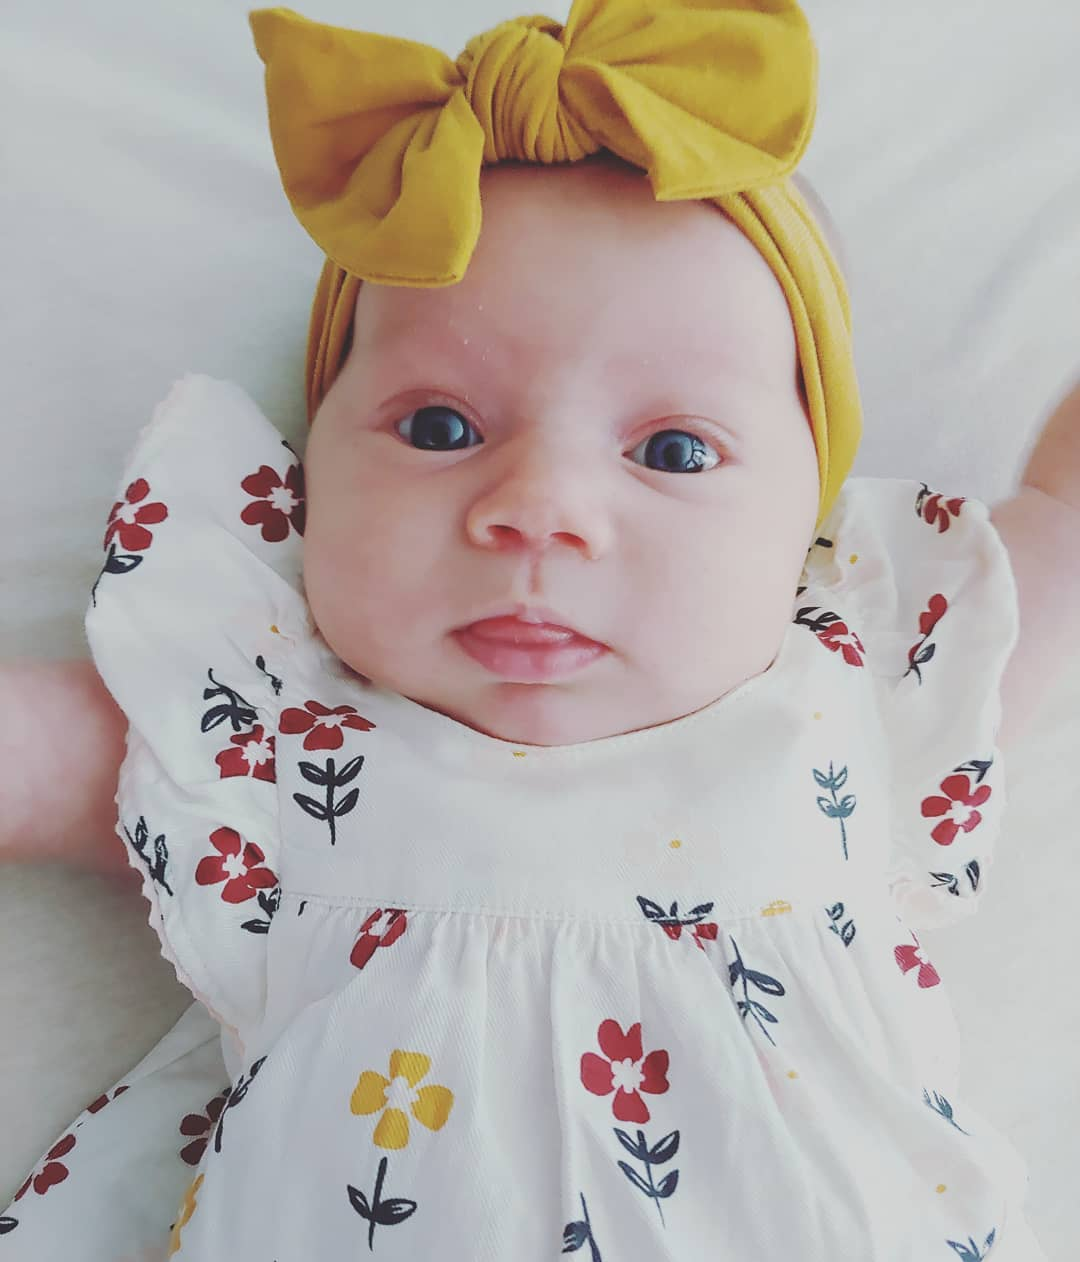 maddie brown's daughter evie closeup